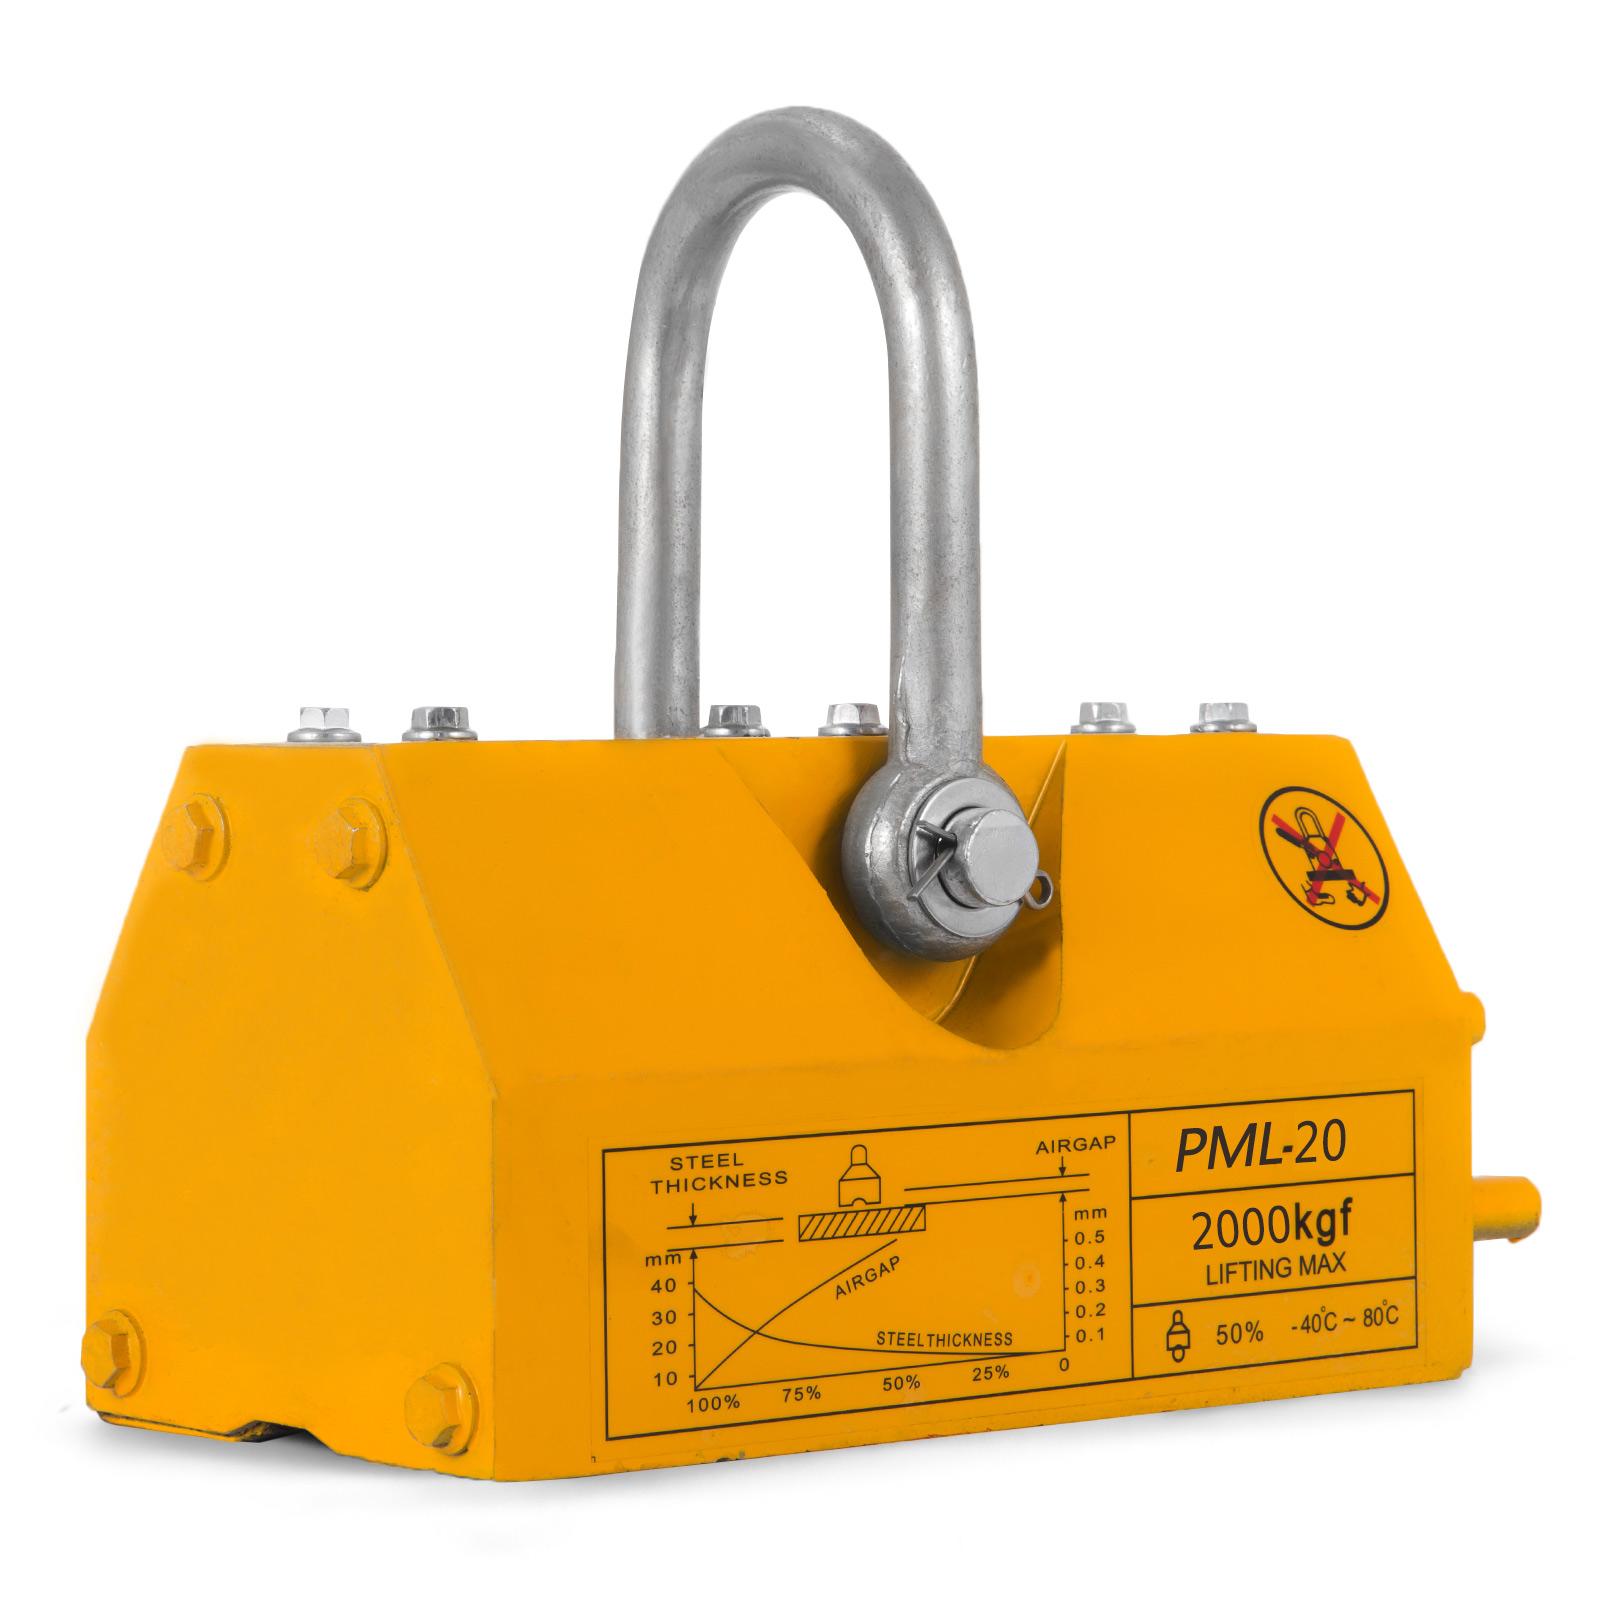 100-300-600-1000KG-Steel-Magnetic-Lifter-Heavy-Duty-Crane-Hoist-Lifting-Magnet miniature 90